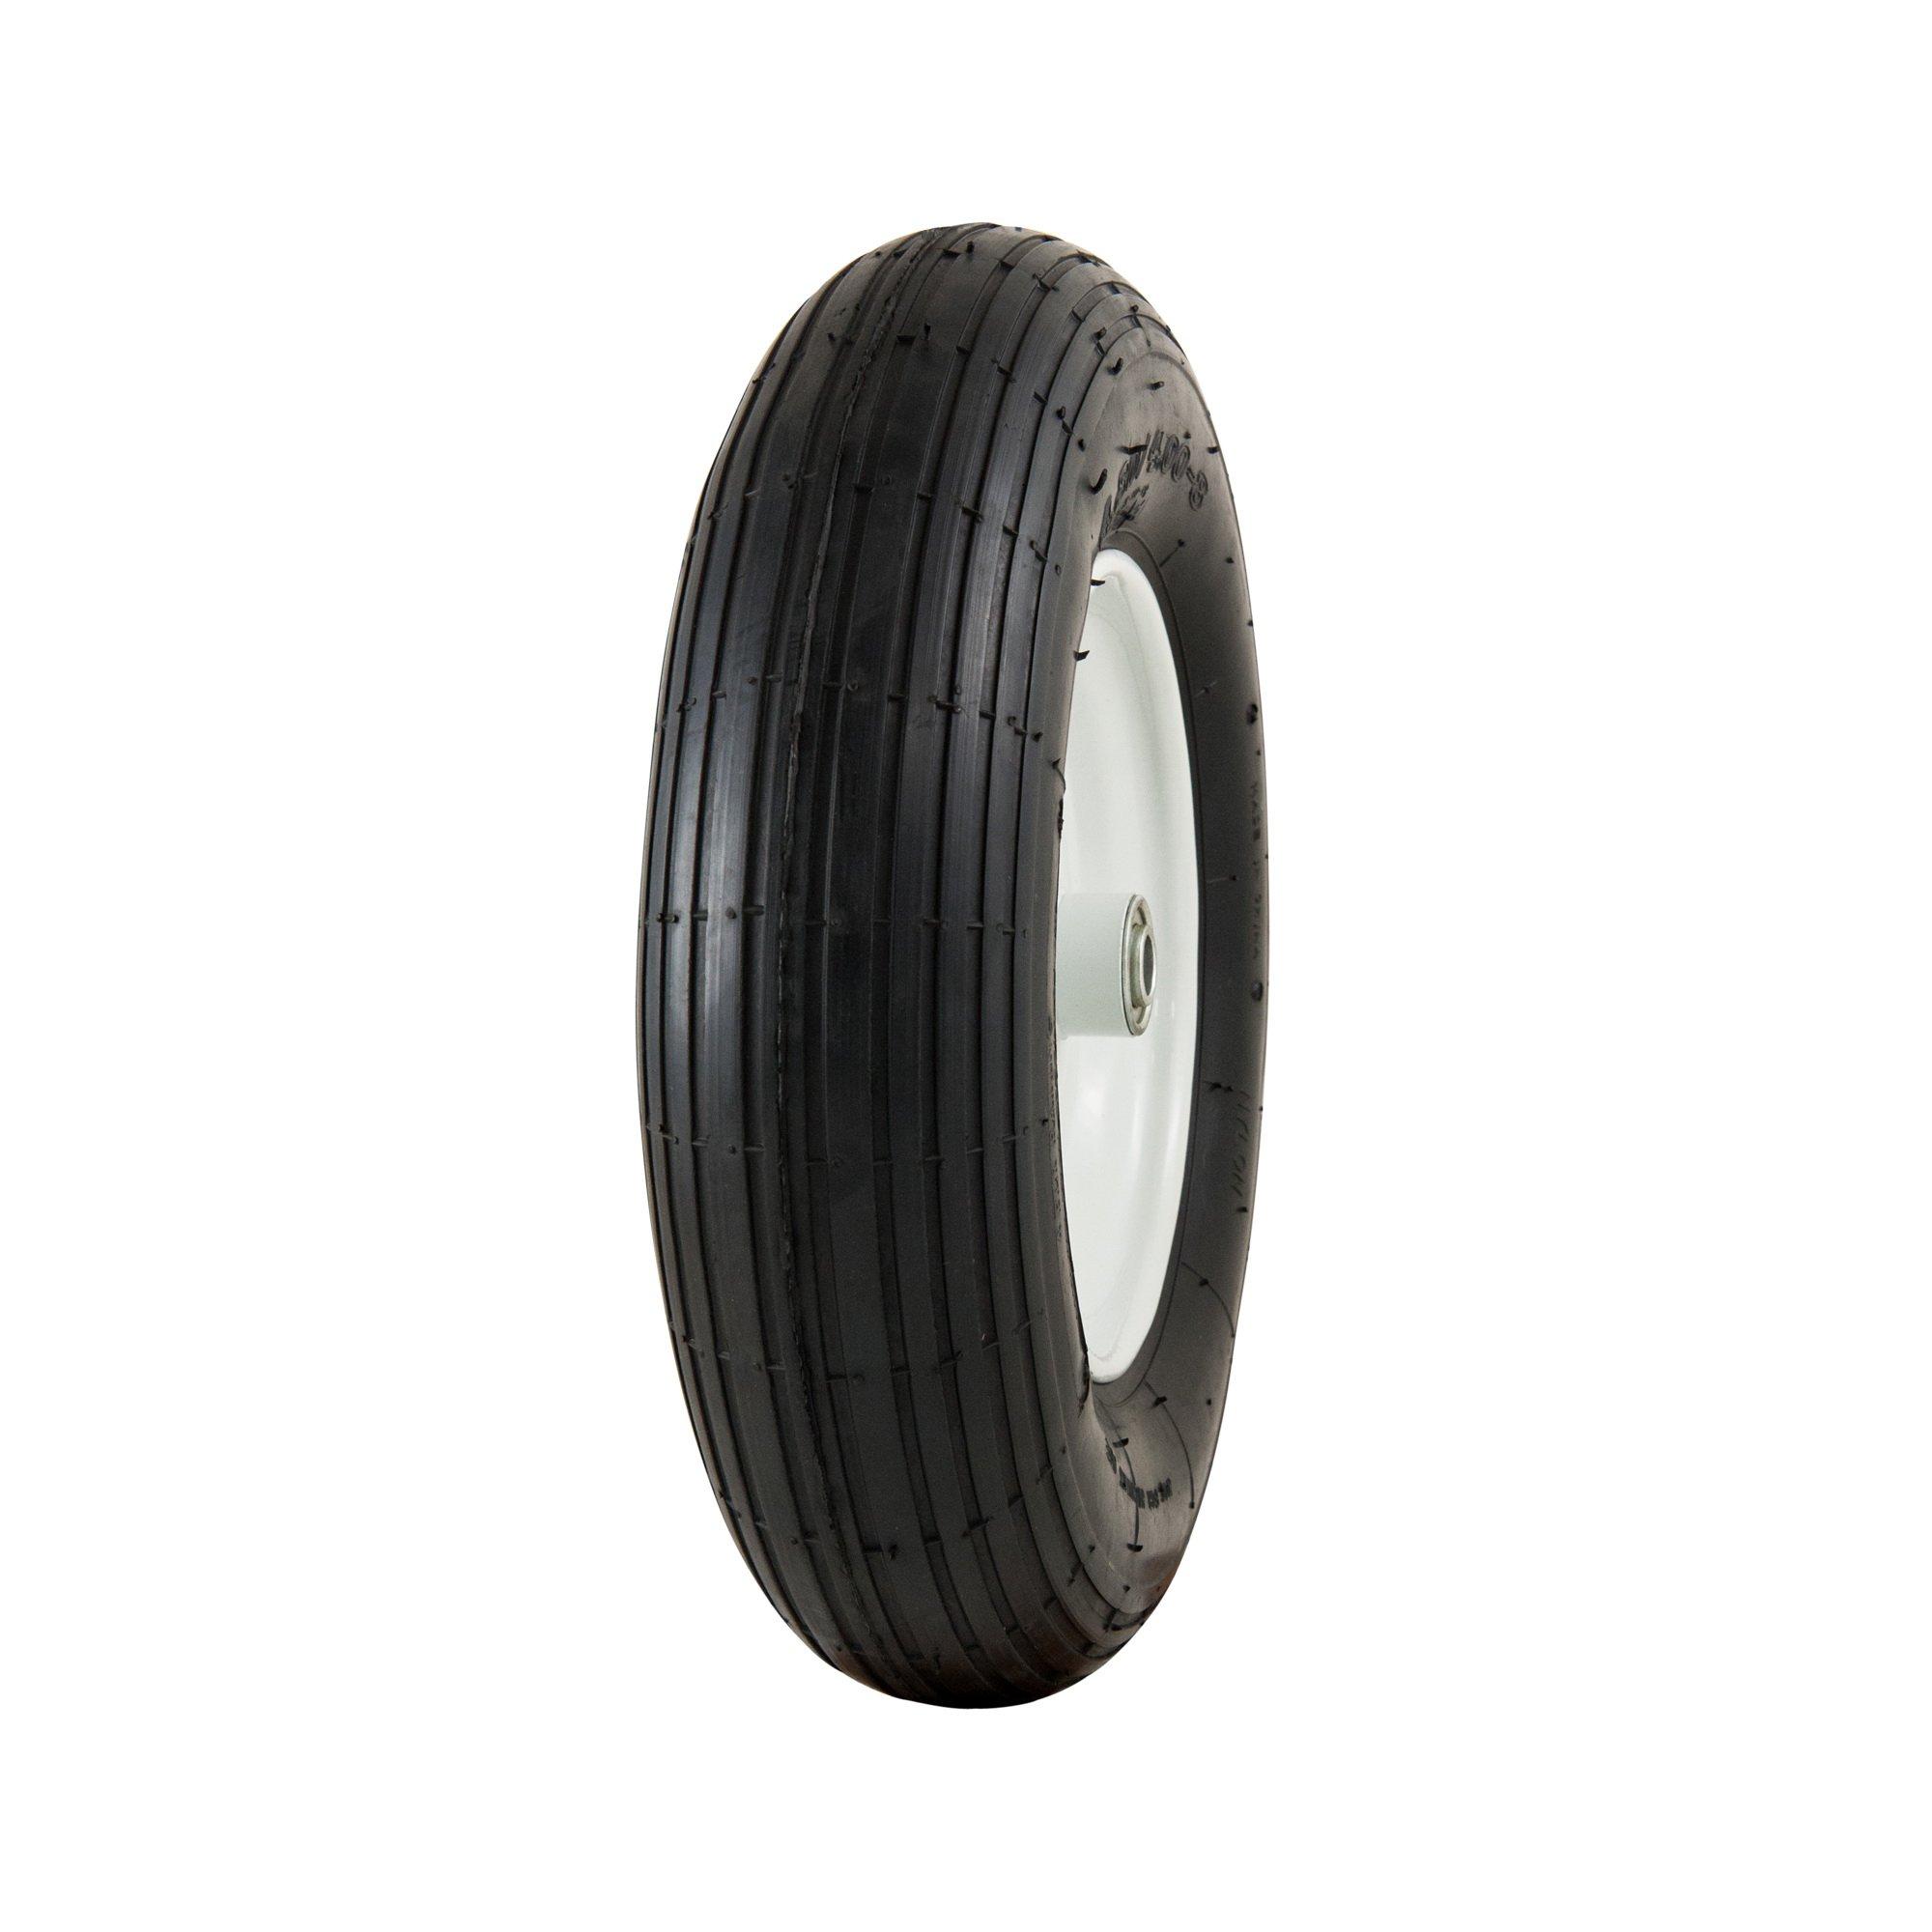 Marathon 4.80/4.00-8'' Pneumatic (Air-Filled) Tire on Wheel, 3'' Hub, 5/8'' Bearings